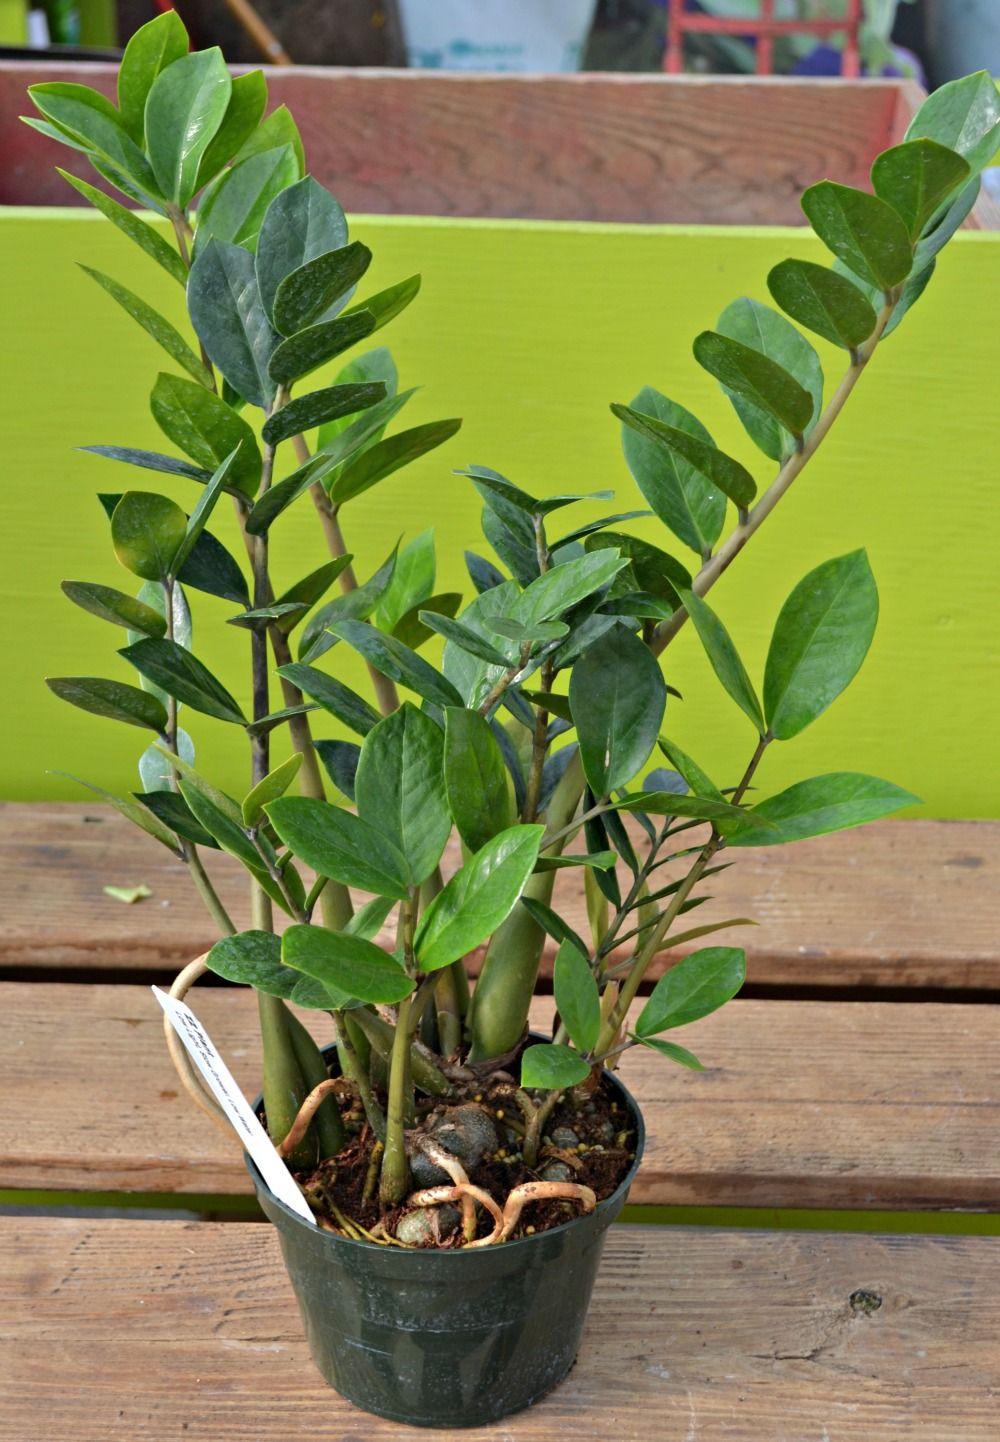 Grow light for houseplants - Zz Plant